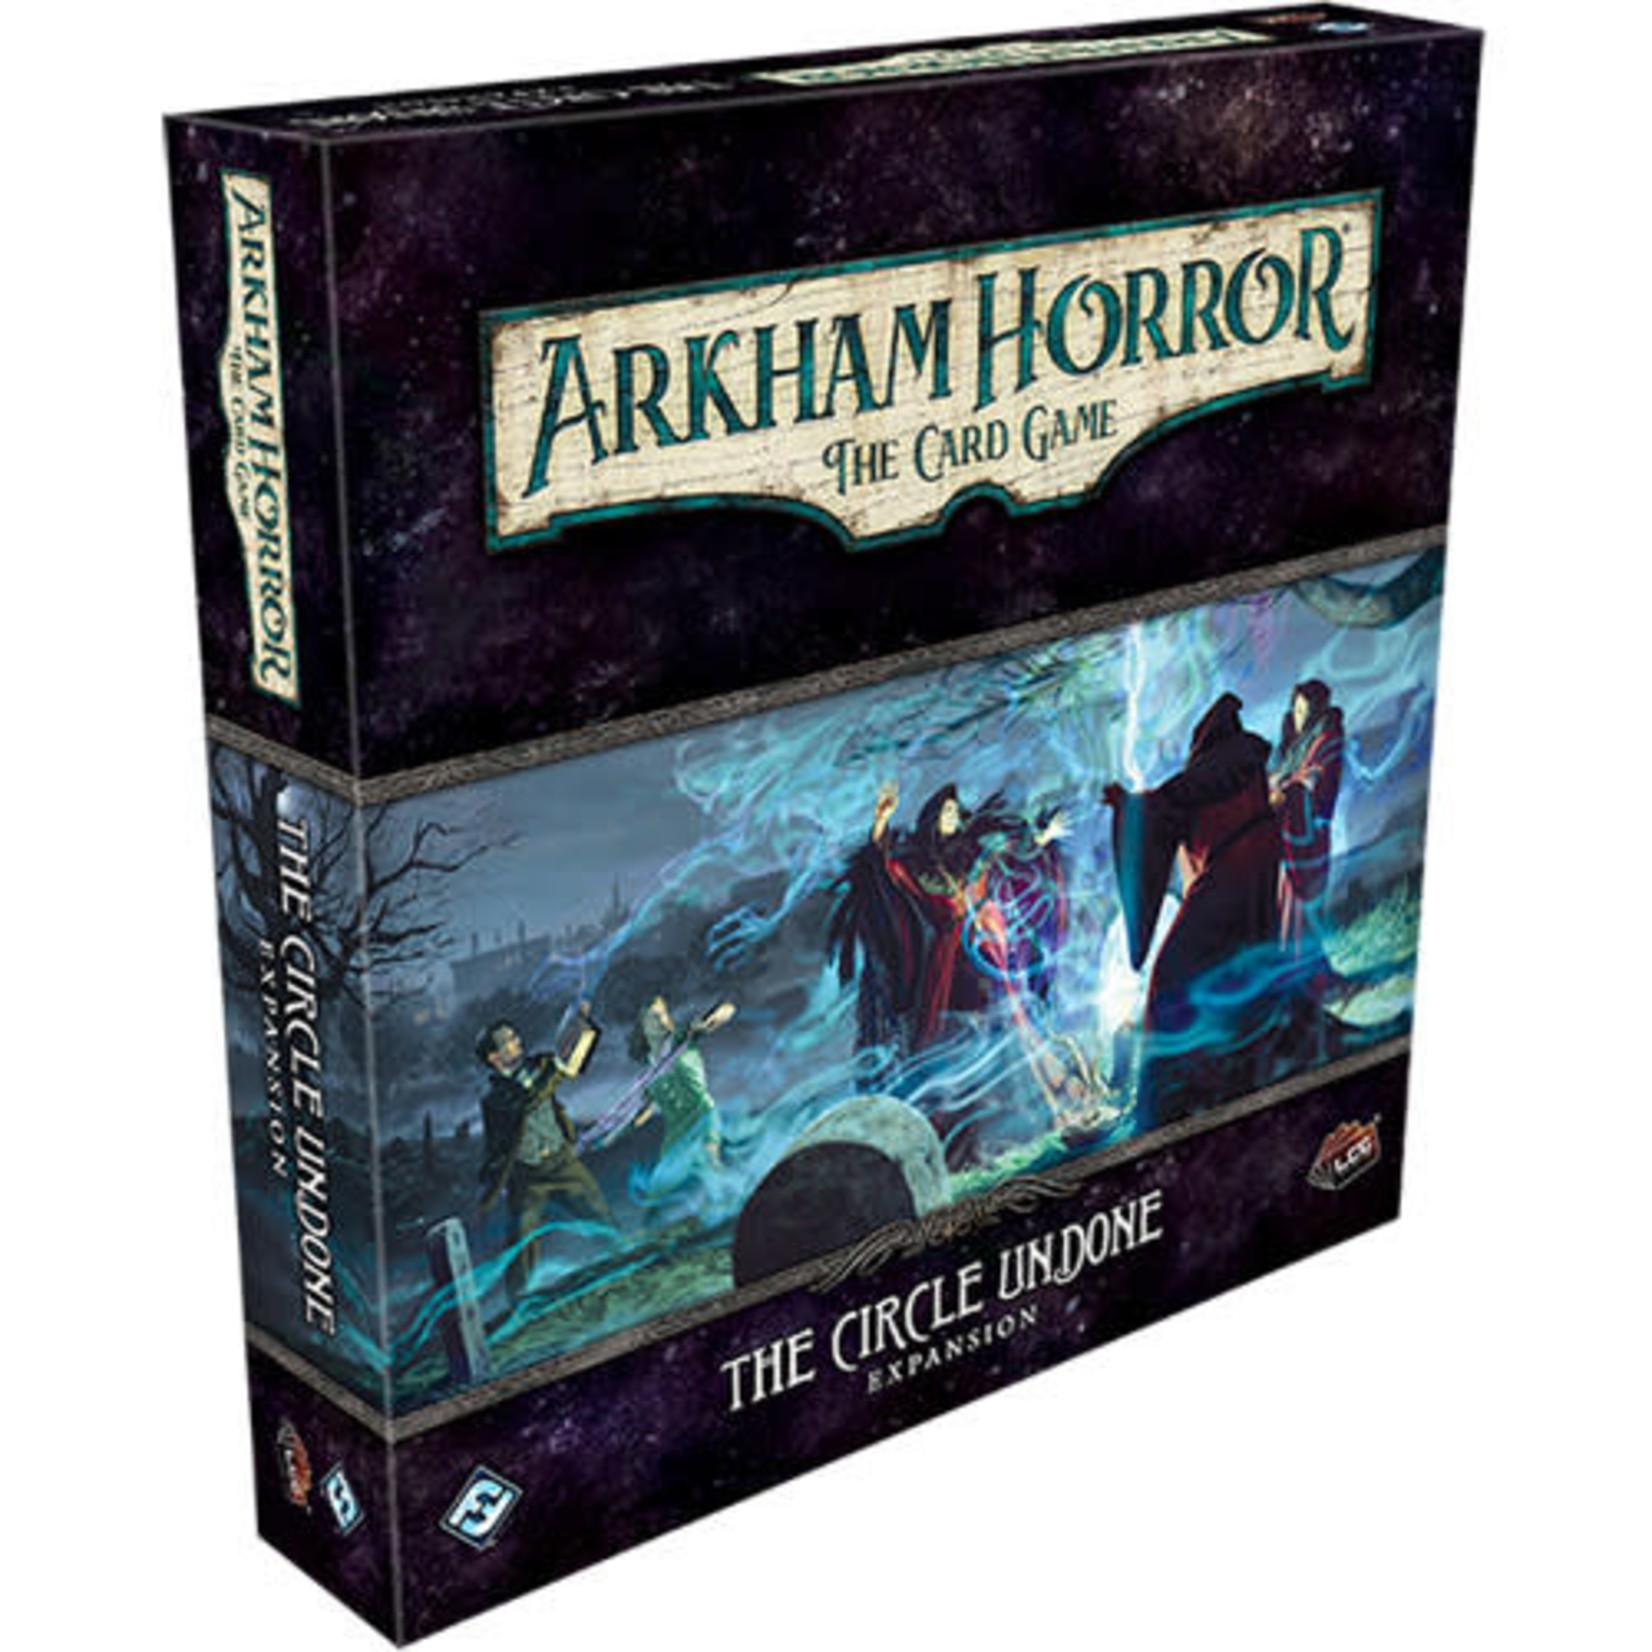 Arkham Horror LCG: The Circle Undone Expansion